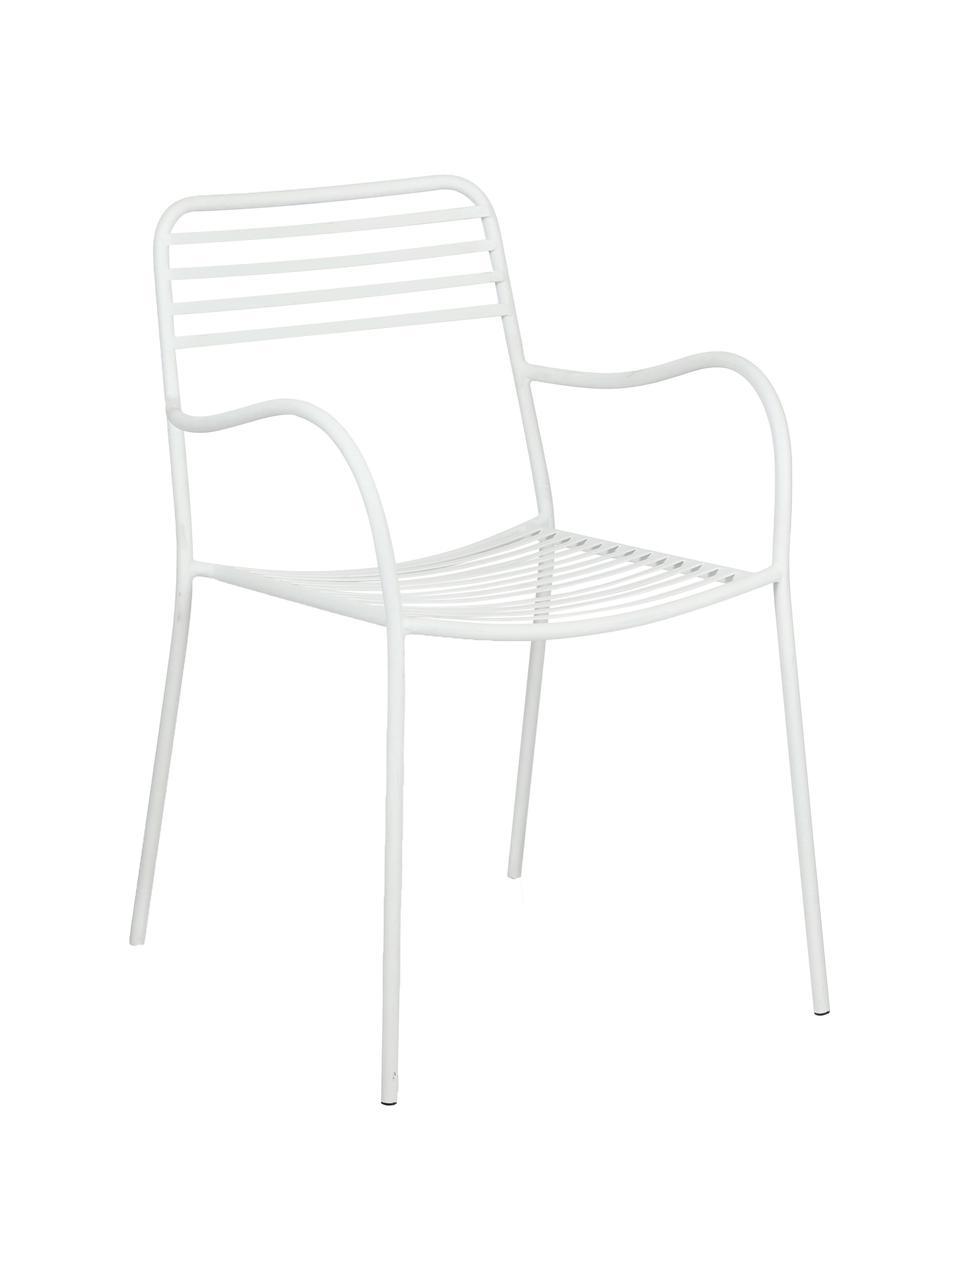 Kovová balkonová židle spodručkami Tula, 2 ks, Bílá